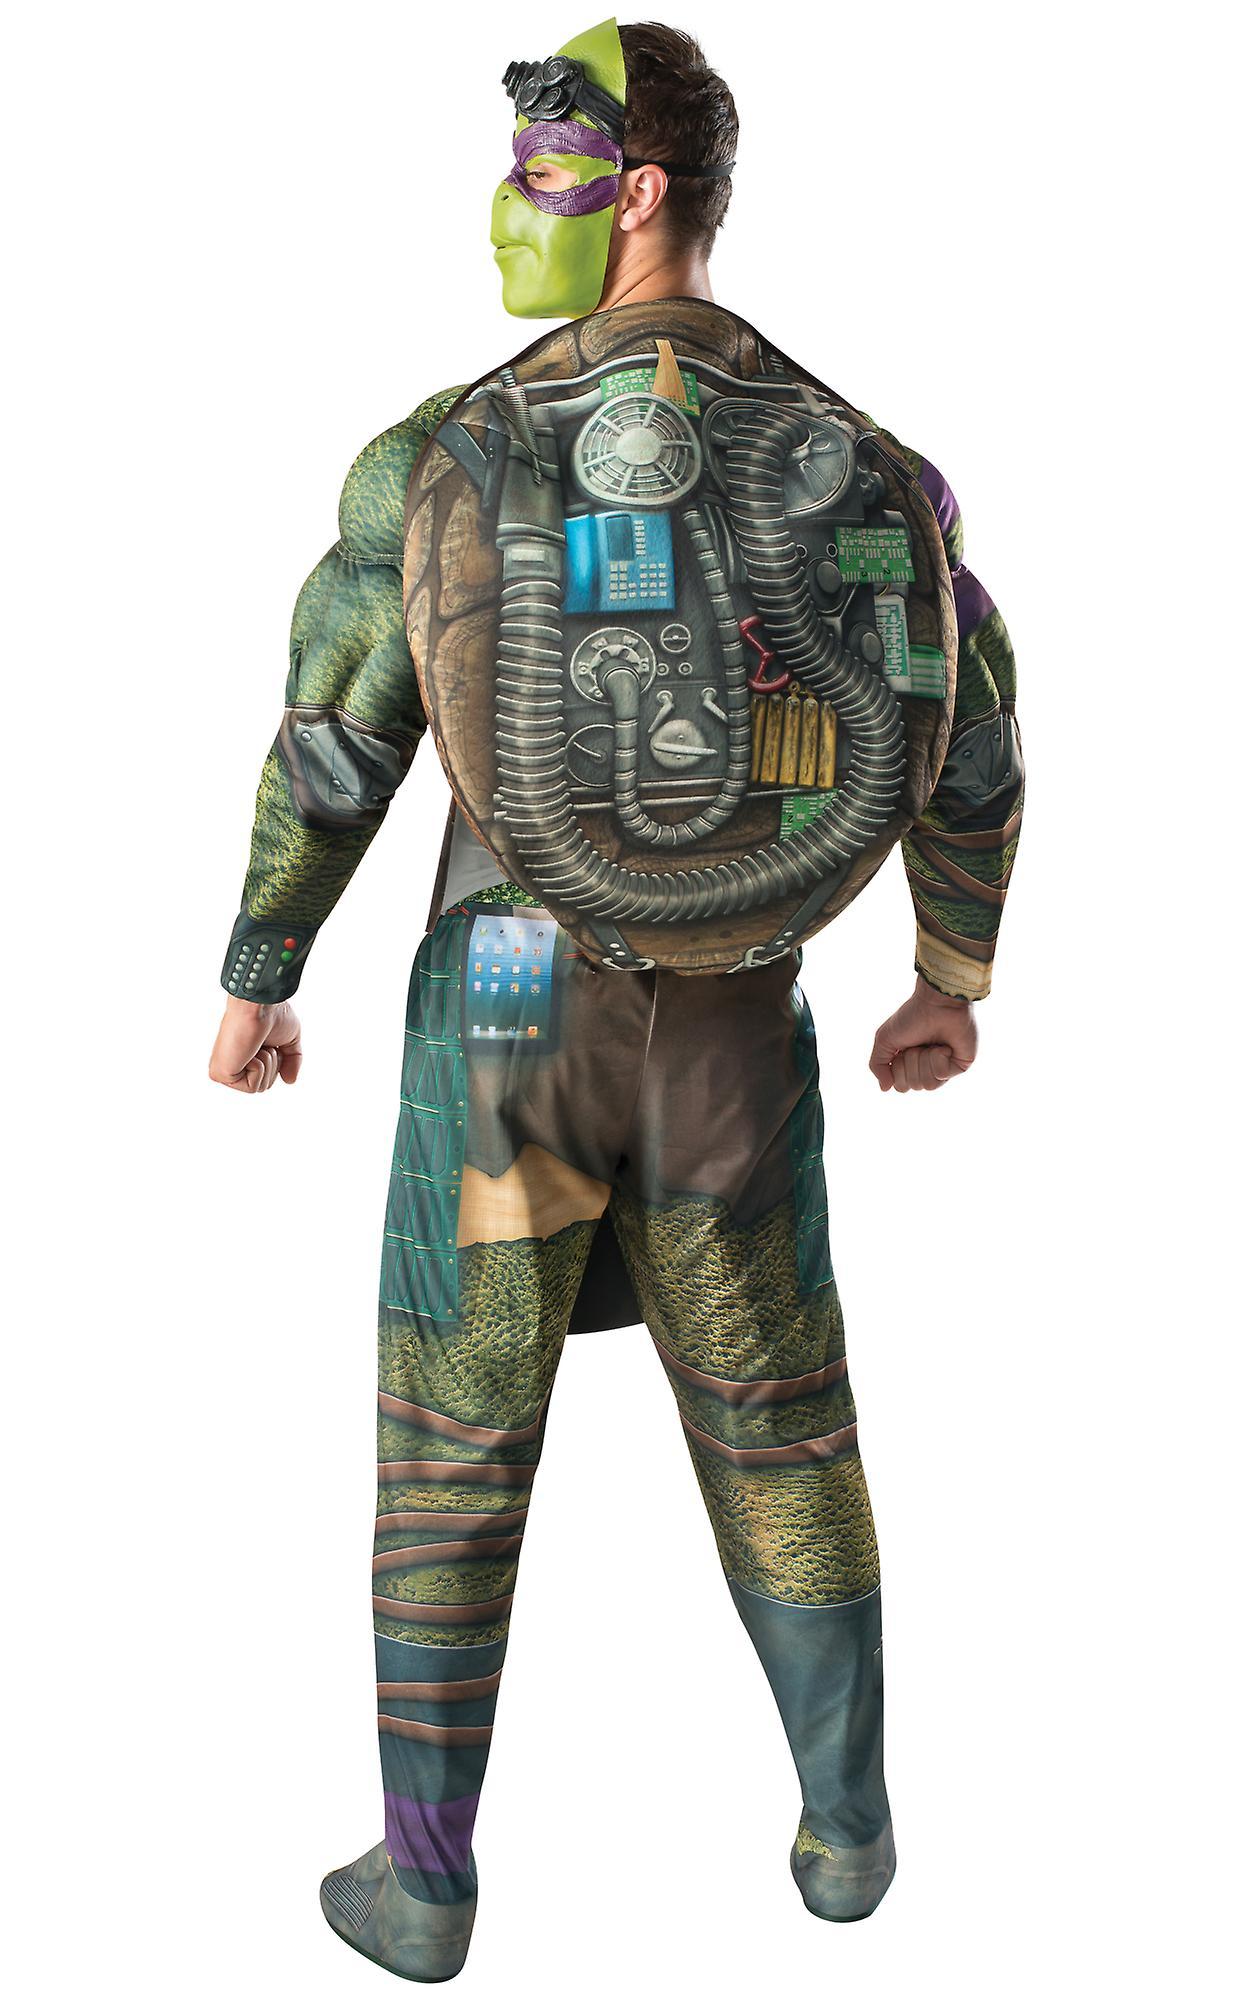 a1cf3049b92 Donatello Don Donnie Teenage Mutant Ninja Turtles TMNT Superhero Men Costume